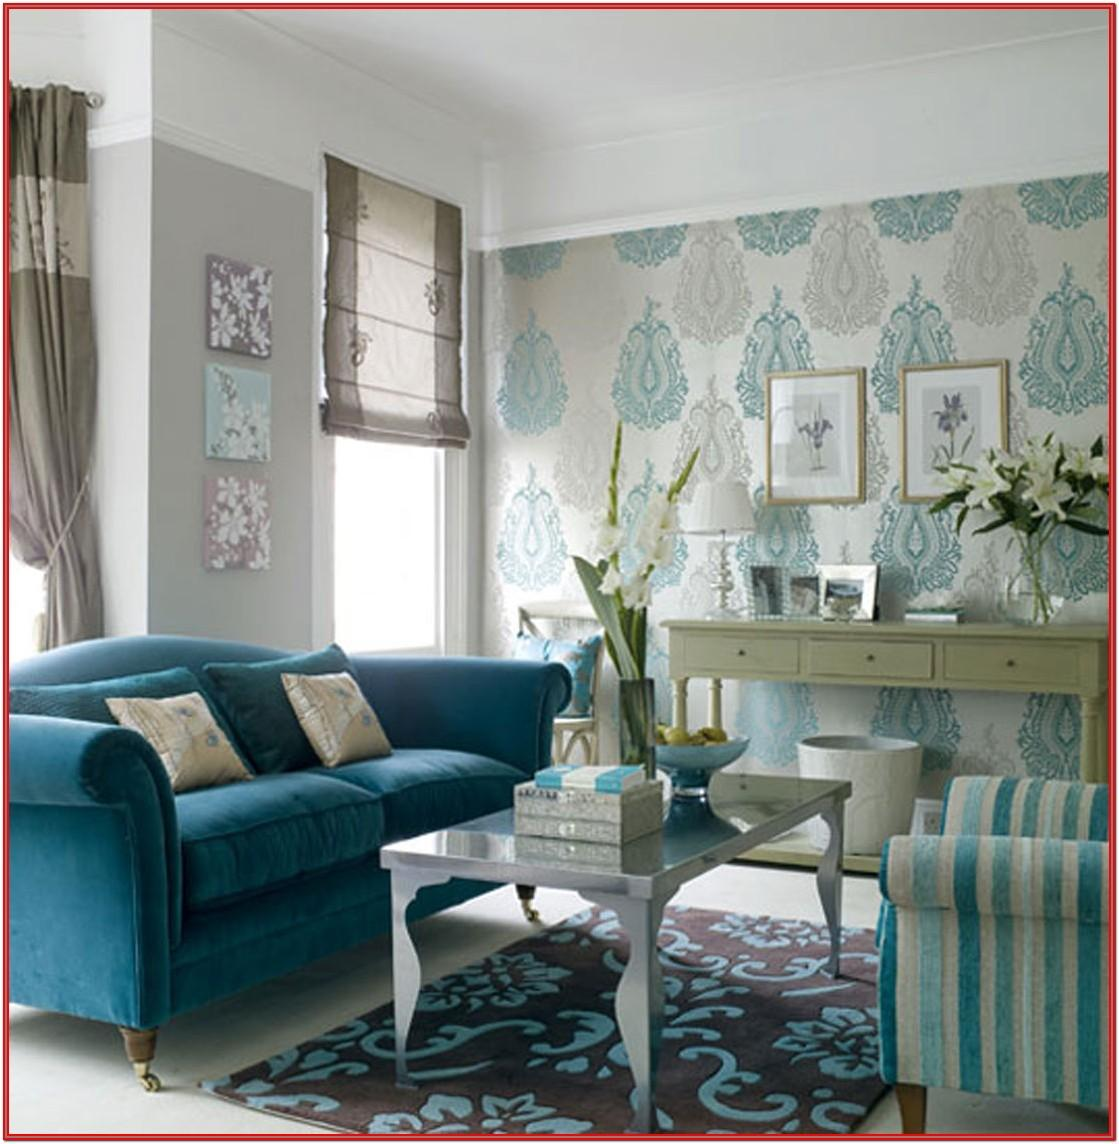 Interior Design Ideas Teal Living Room